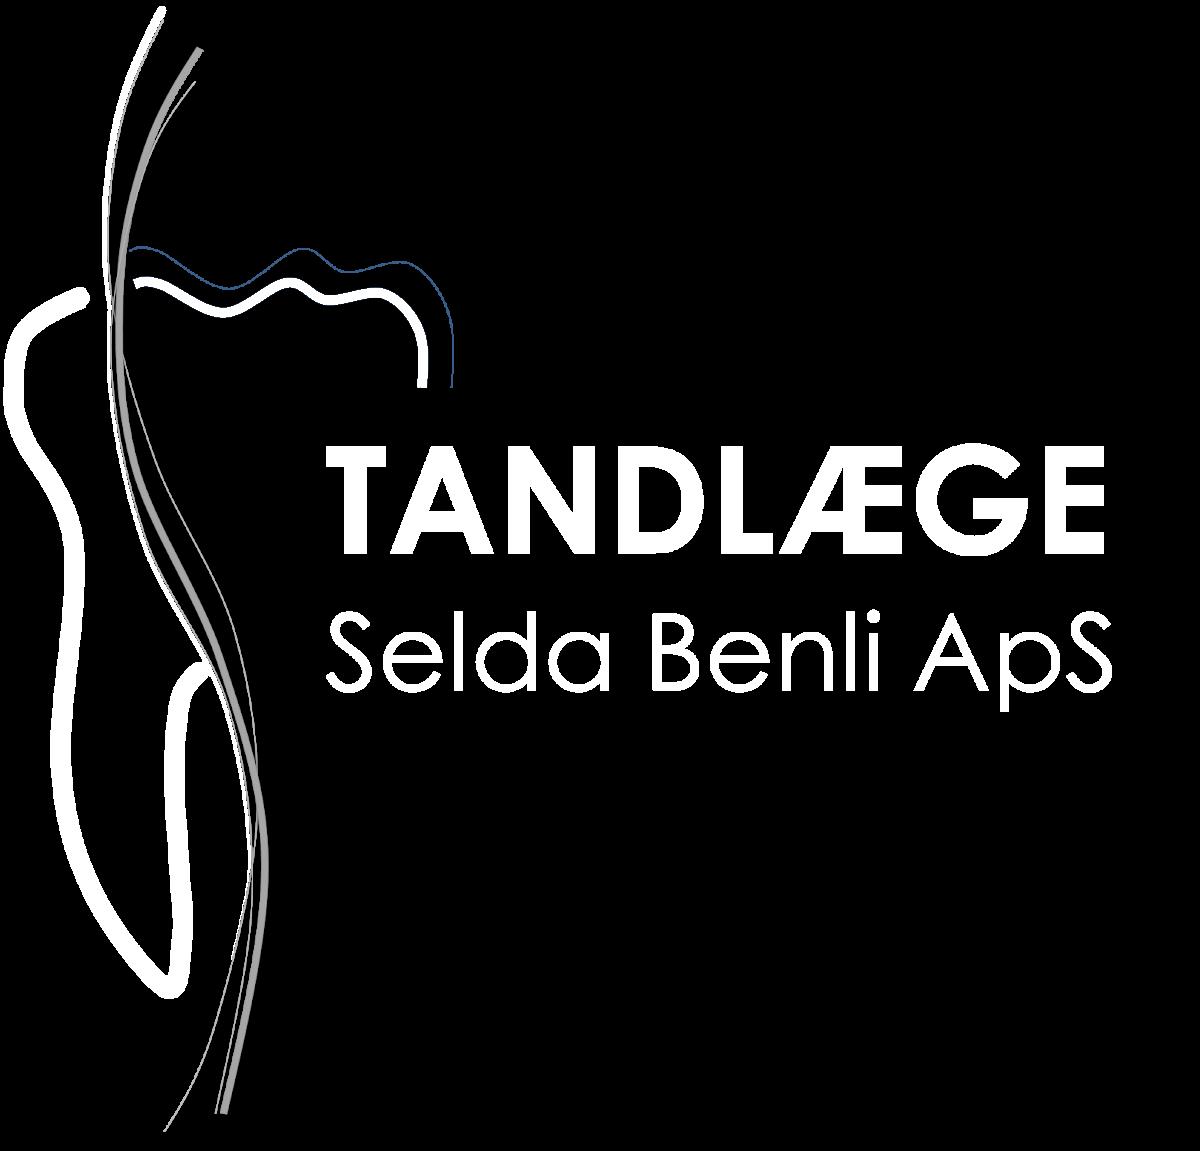 Tandlæge Selda Benli ApS